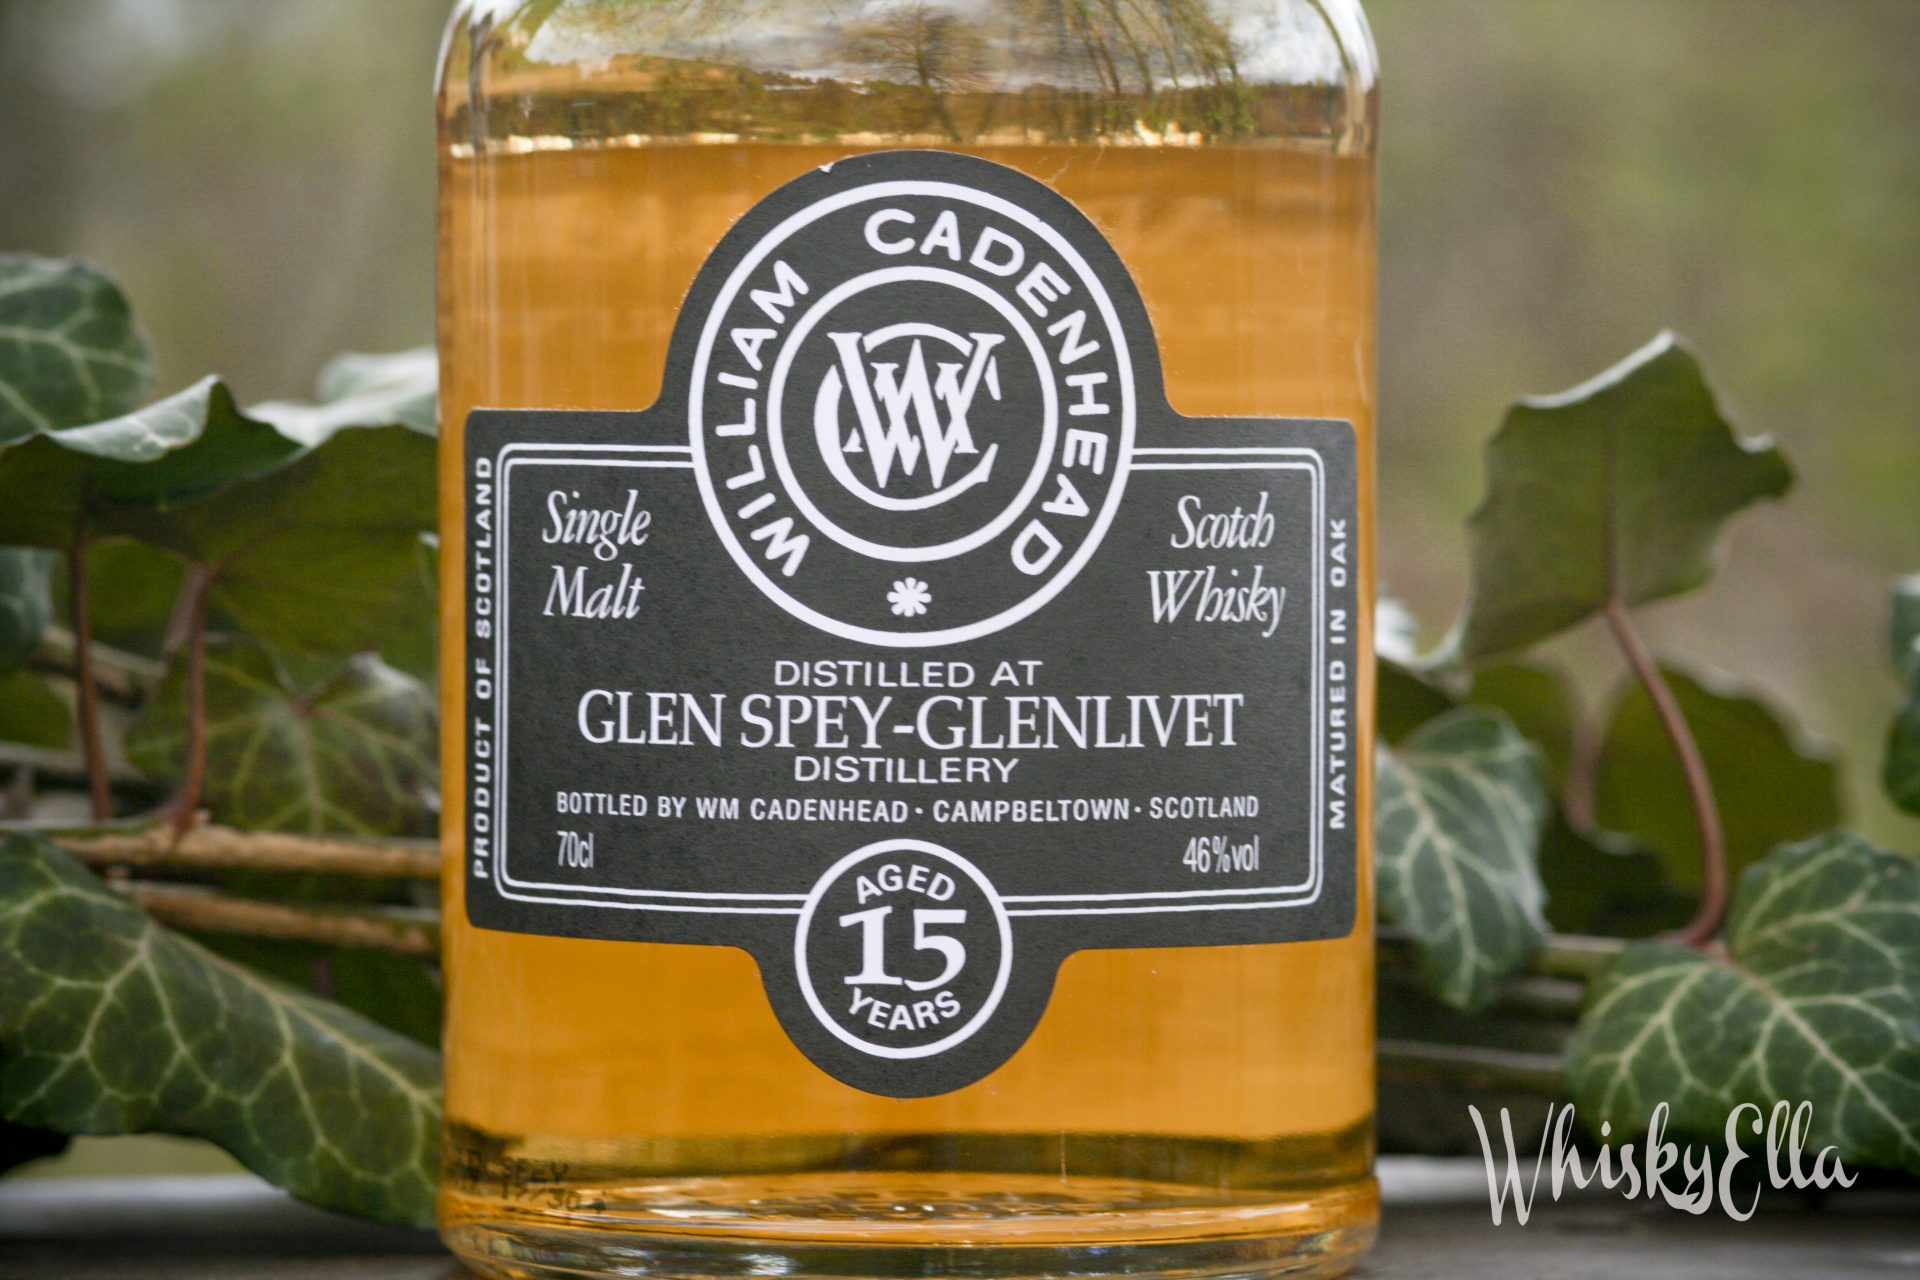 Nasza recenzja Glen Spey 15 yo Cadenhead's 2017 #66